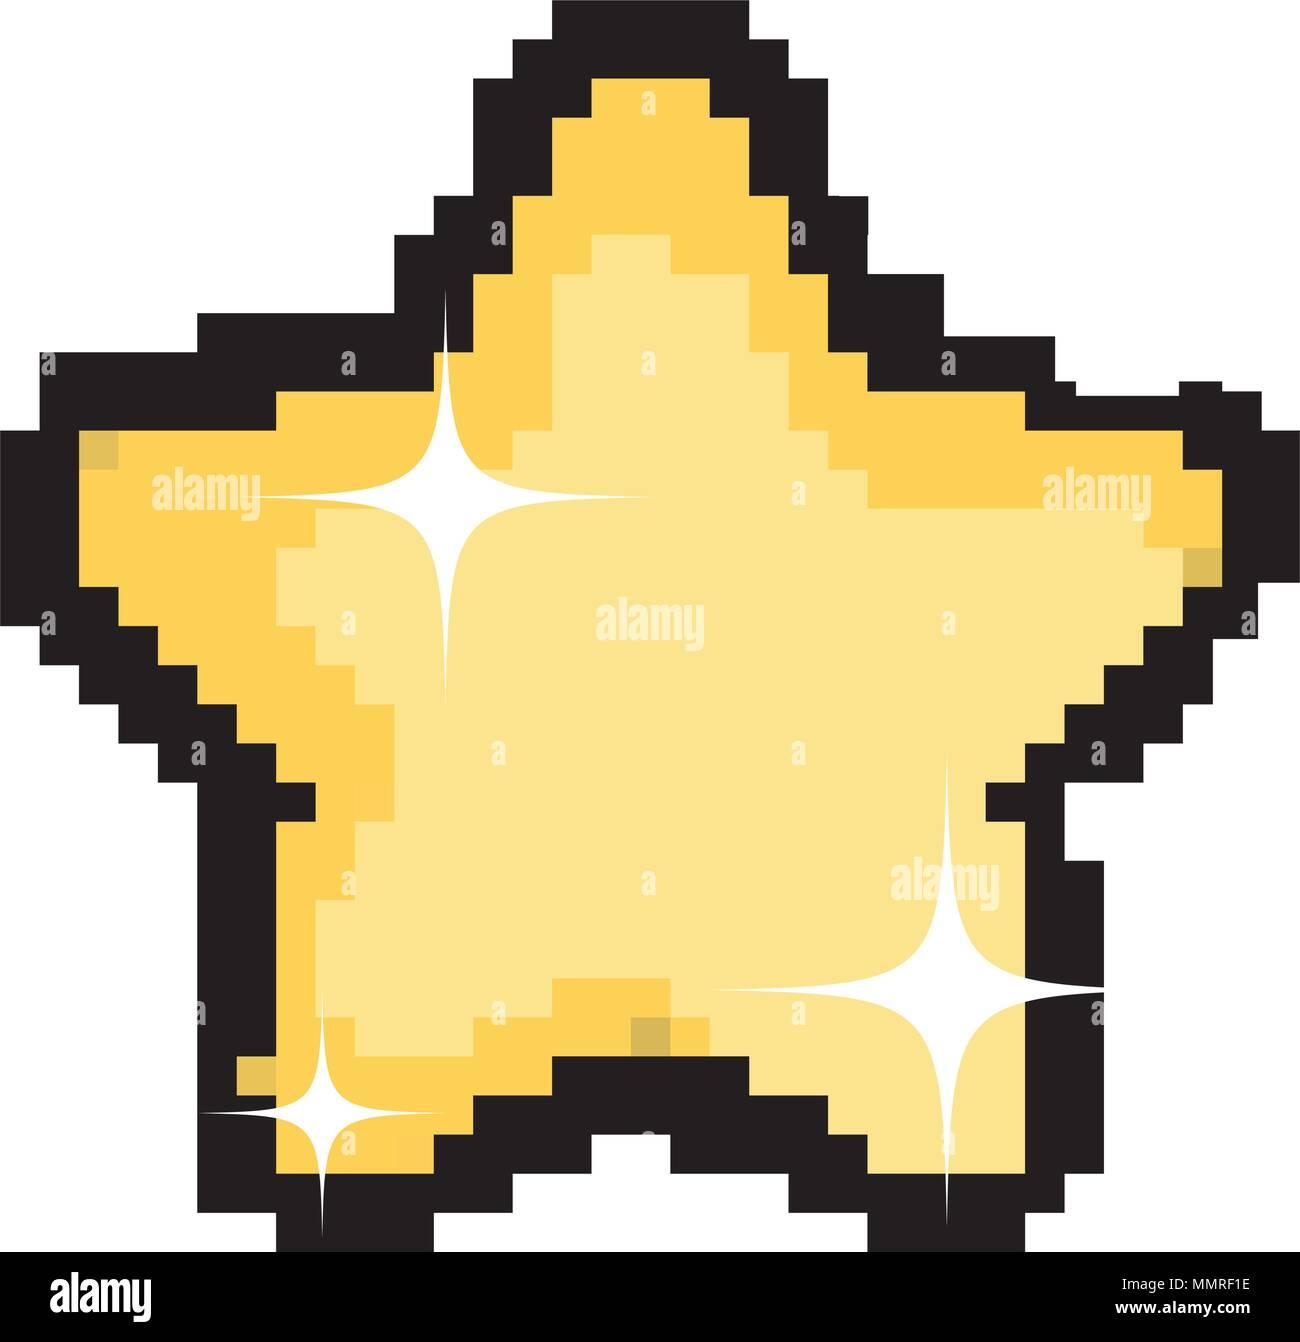 Pixel Star Photos Pixel Star Images Alamy